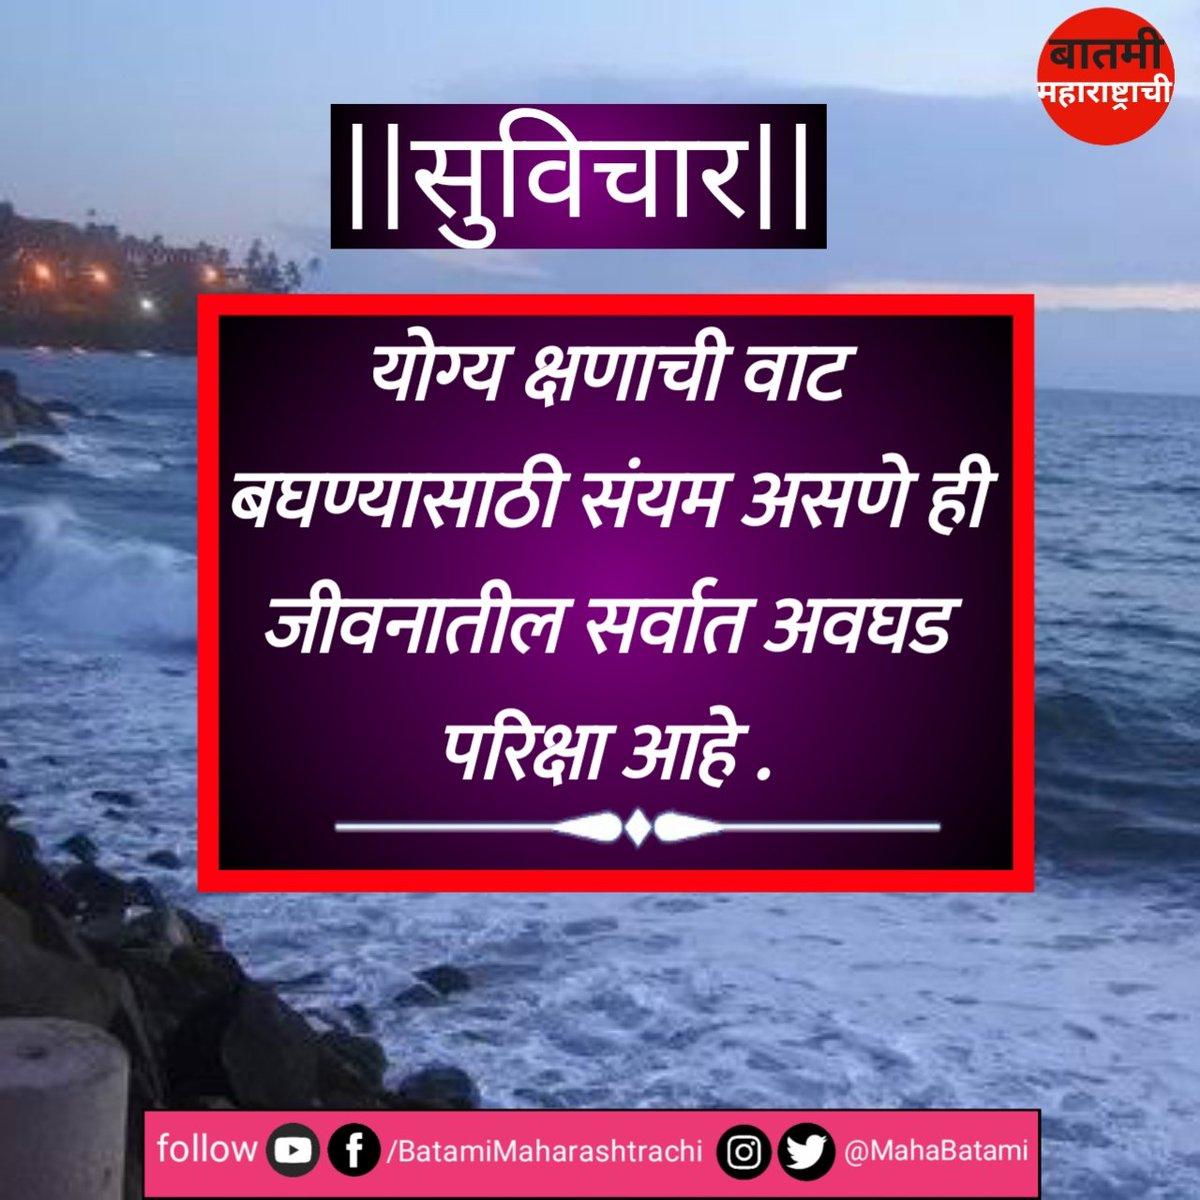 .........सुप्रभात.........  @MahaBatami @BeyondMarathi @MarathiRT @anubandhmarathi @MarathiBrain @marathivichar @Marhathi @YoMarathi @marathibraincom @Marathi_Kavita8 #ThoughtForTheDay #GoodMorningWorld #motivation  #goodmorning  #thursdayvibes  #ThursdayThoughts #म #मराठीpic.twitter.com/W2p6Zxf6fh